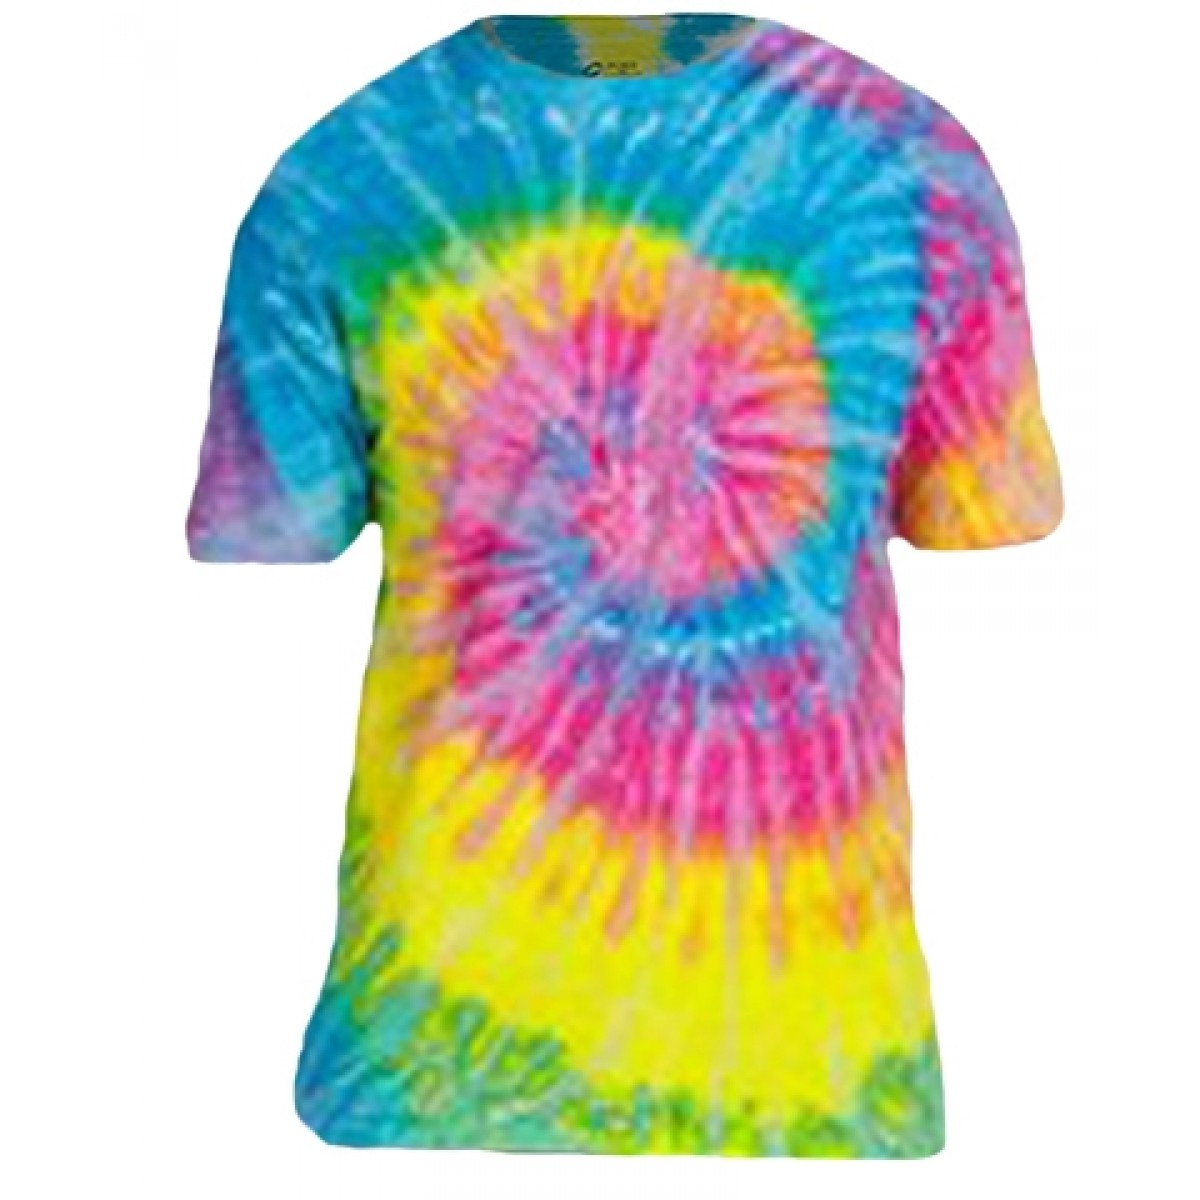 Cotton Short Sleeve T-Shirt / Tie Dye Rainbow